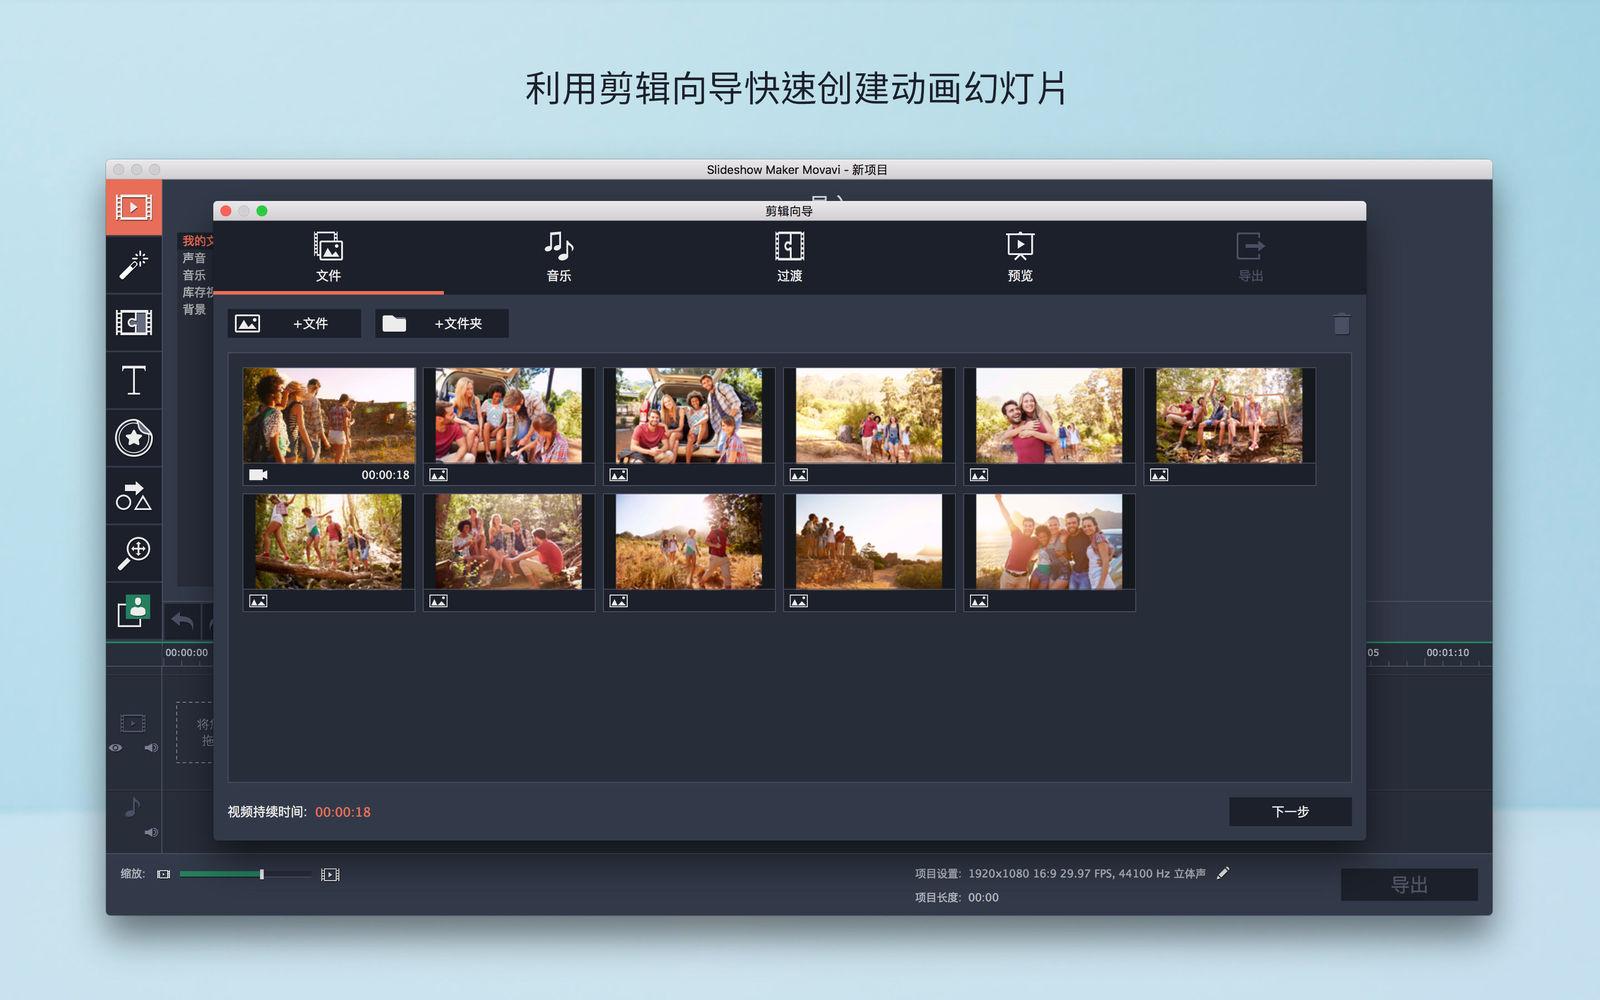 Movavi Slideshow Maker v5.4.0 只需几次点击就能创建一个很酷的幻灯片